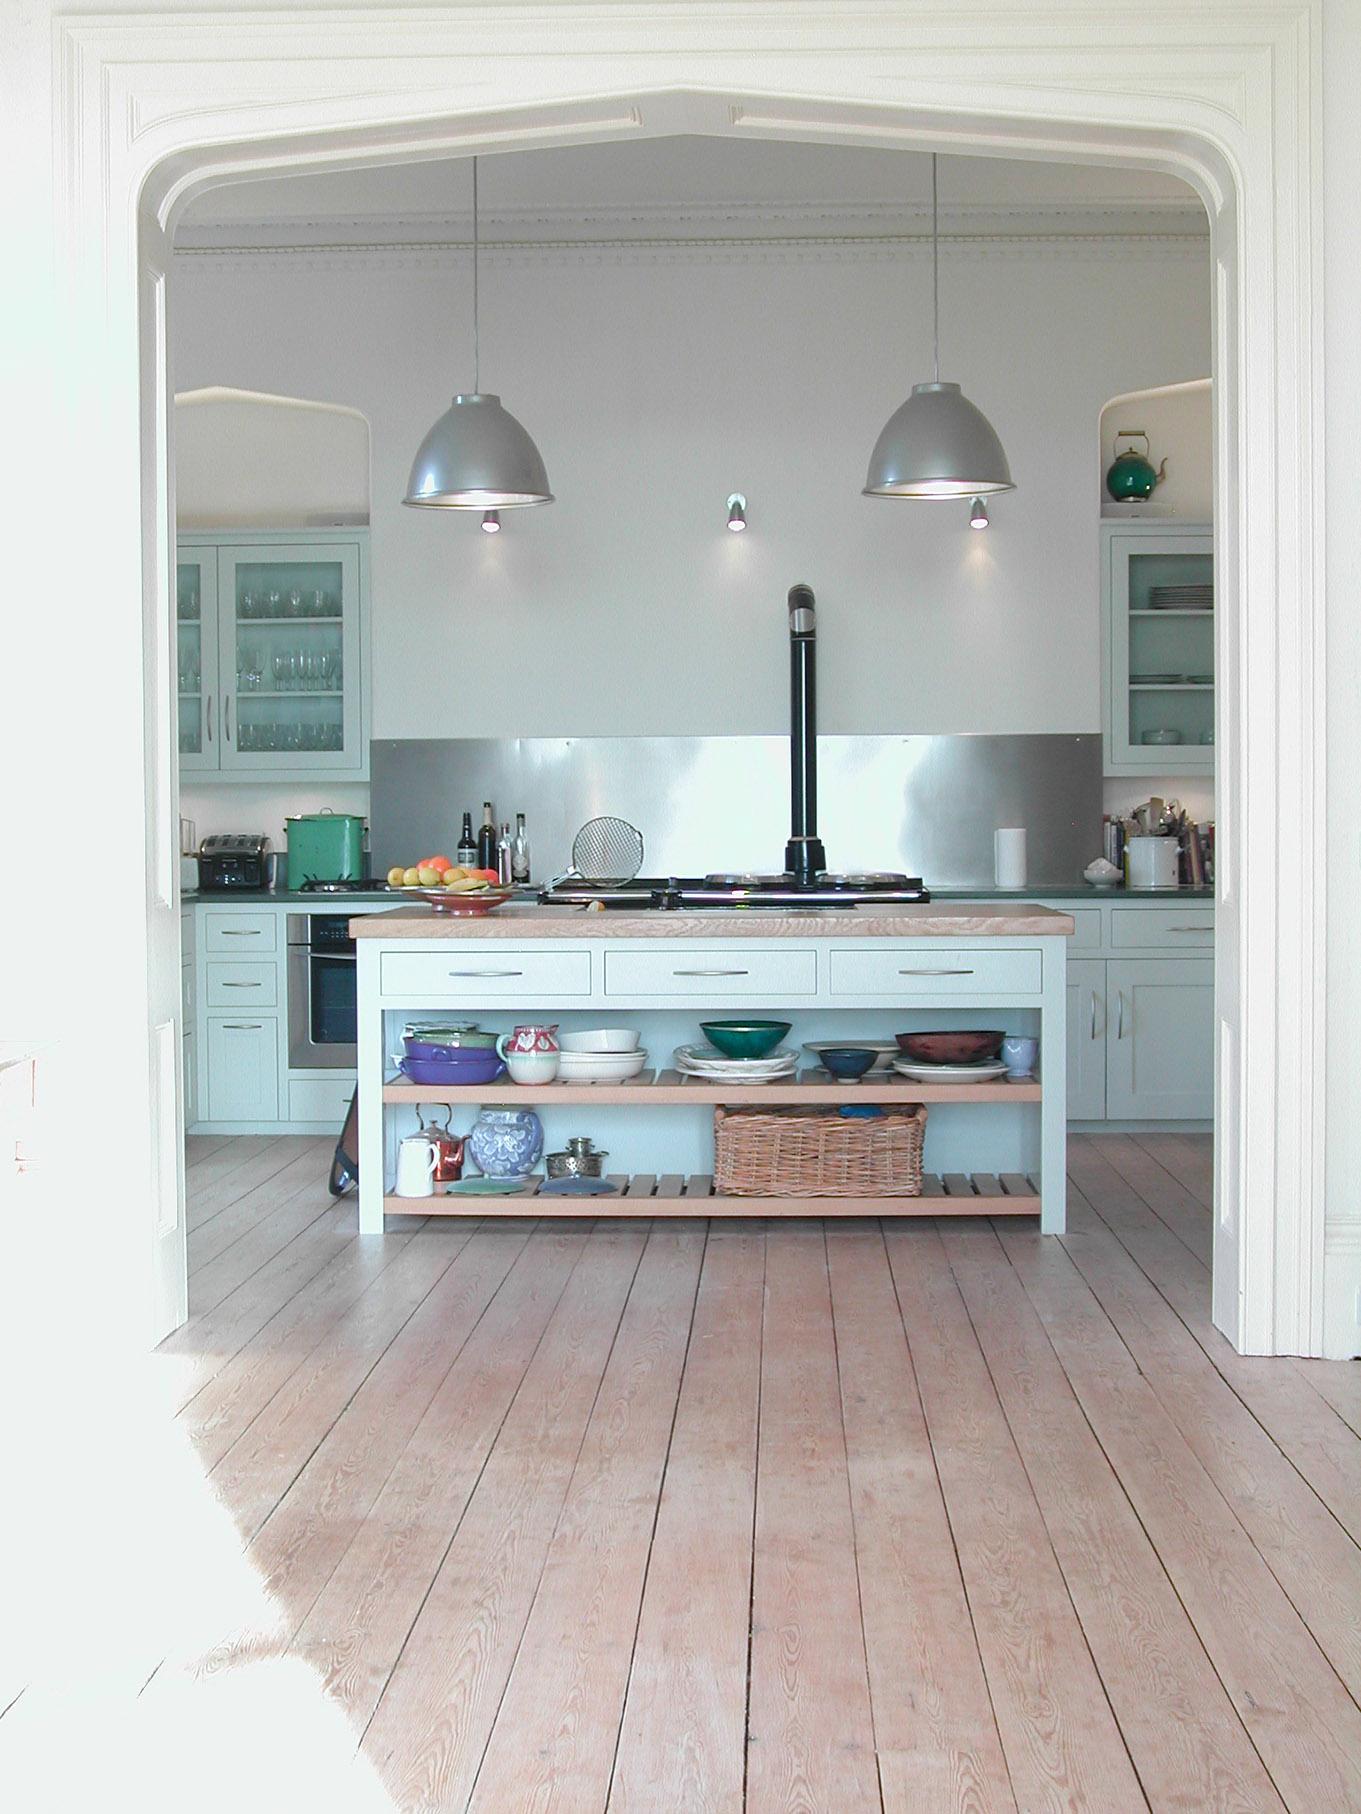 Handmade Kitchens Of. Pragueivory. Handmade Kitchens London ...